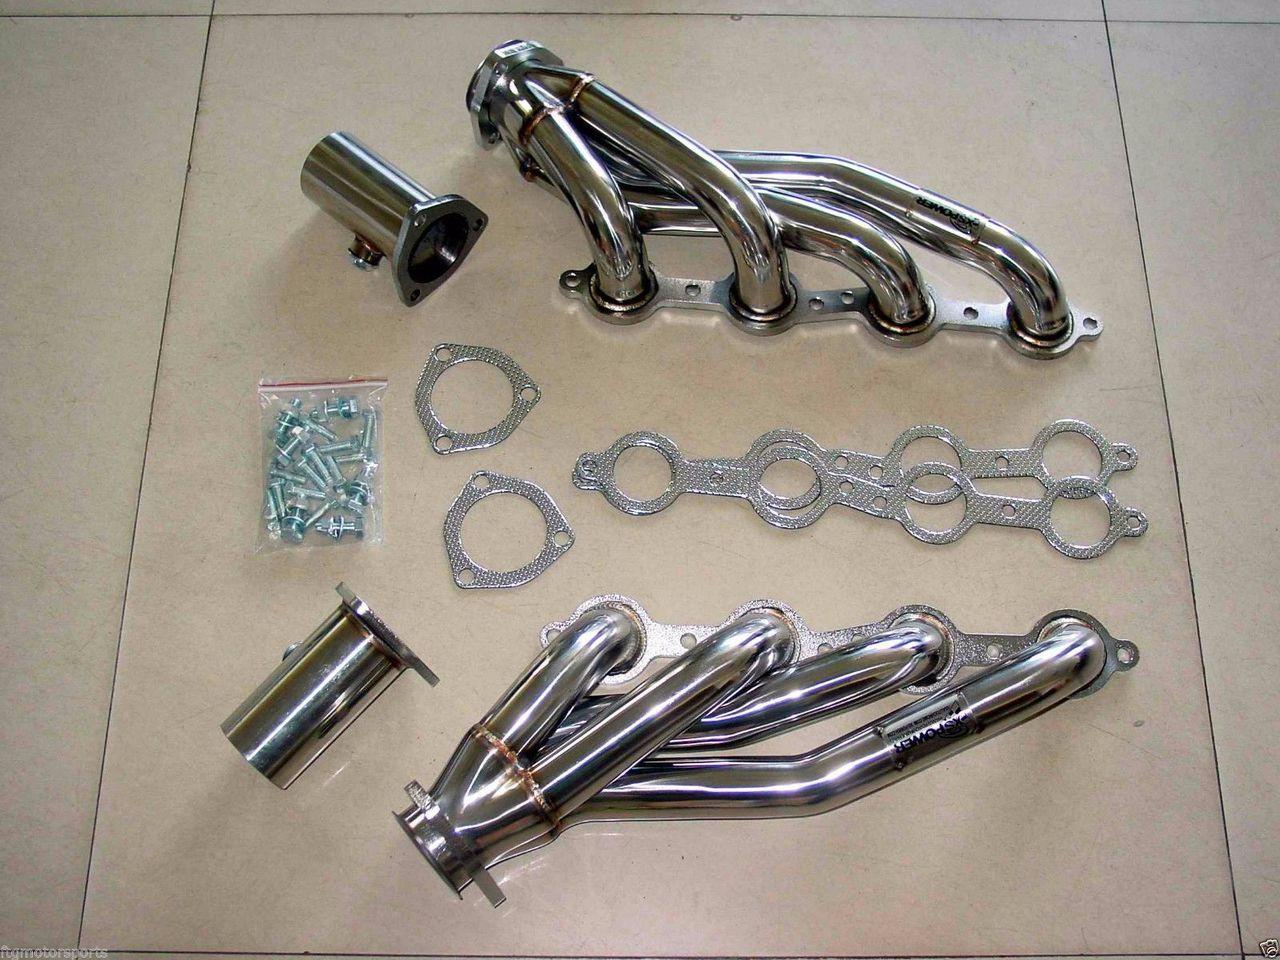 LS1 LS6 LSX LS2 LS7 LS9 Universal Stainless Shorty Chevrolet Engine Swap  Header